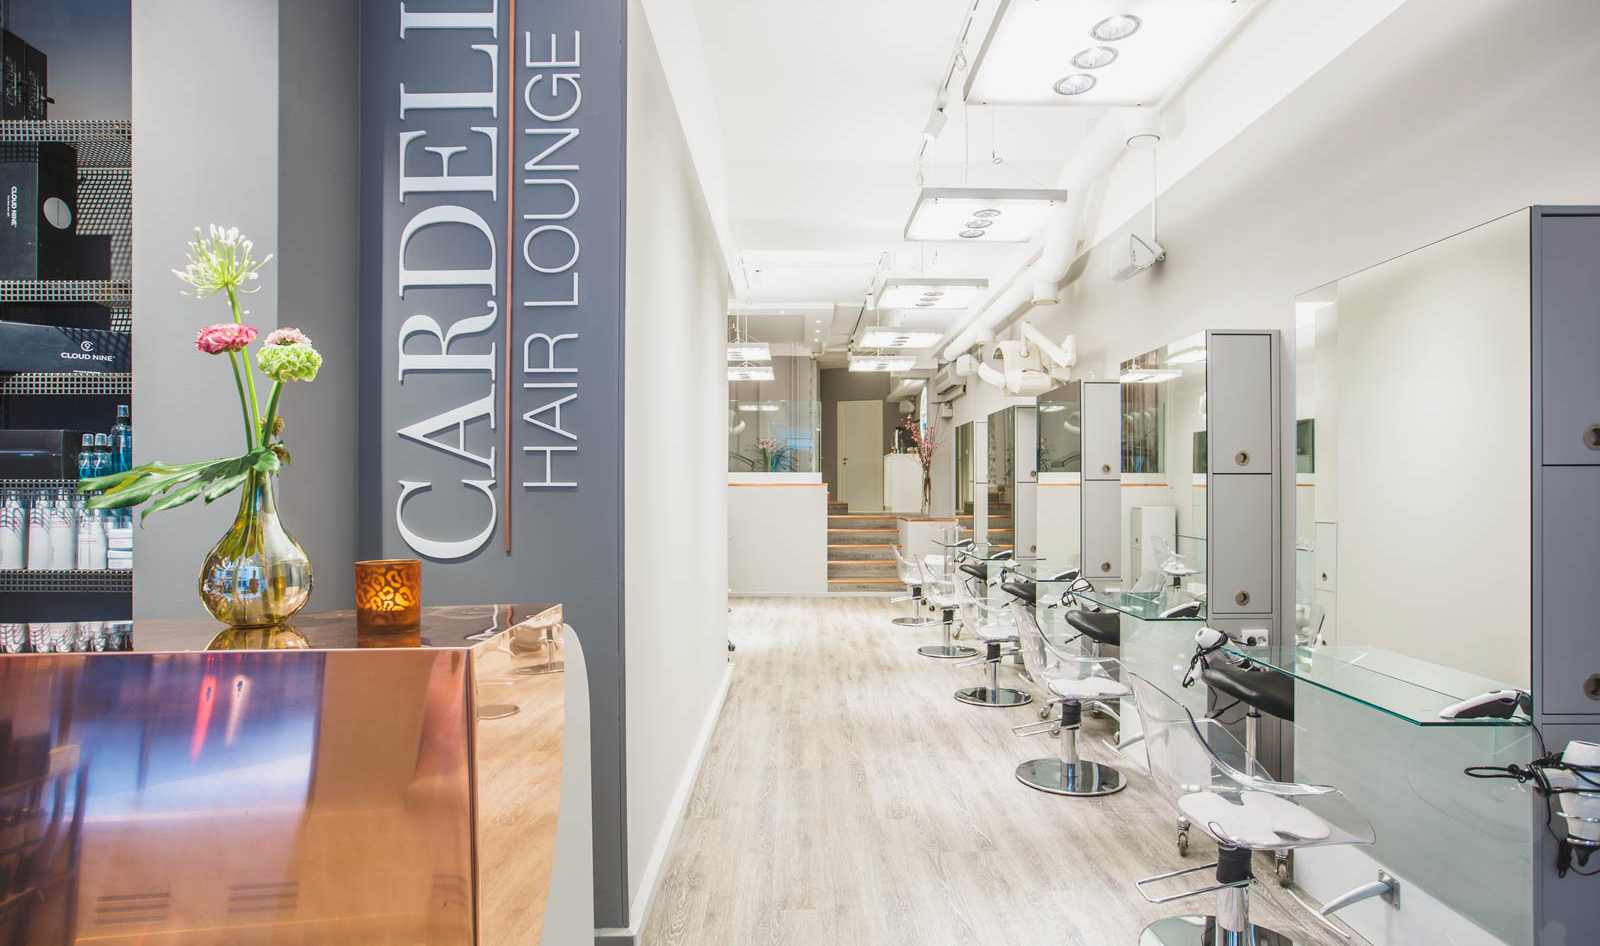 Stor stämningsbild Cardell Hair Lounge